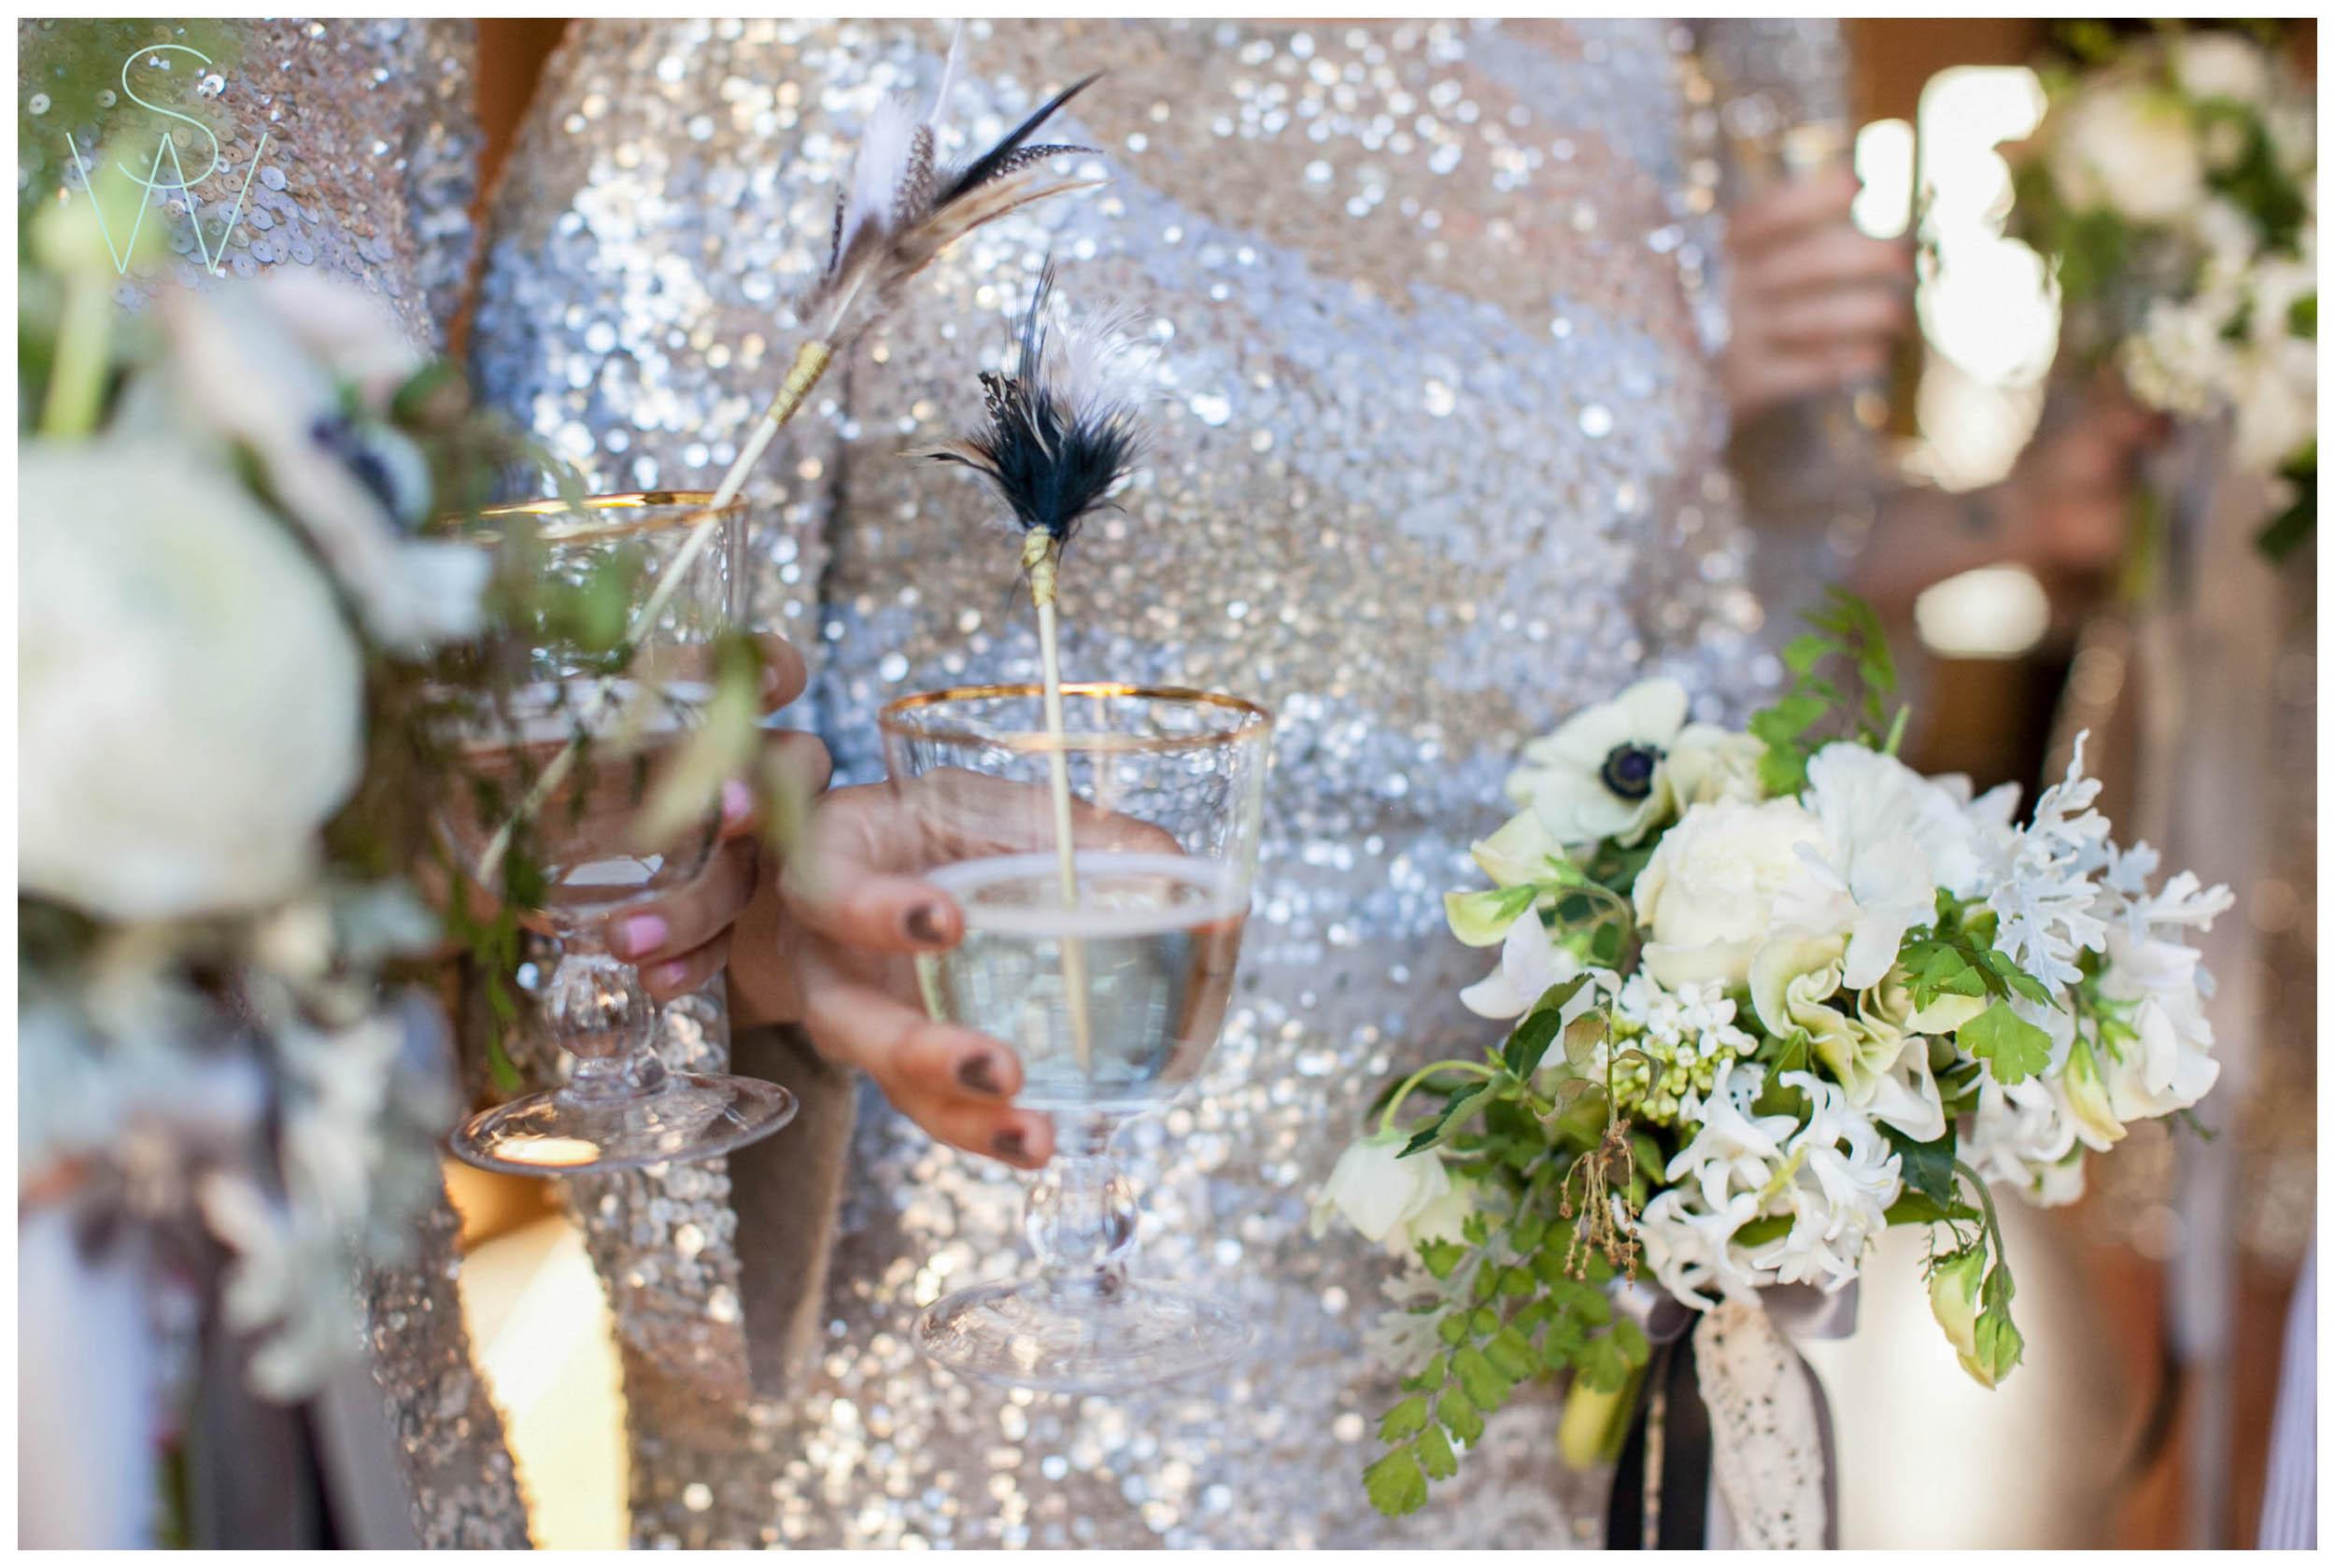 Shewanders.sdma_.wedding.photography-1006.jpg.wedding.photography-1006.jpg